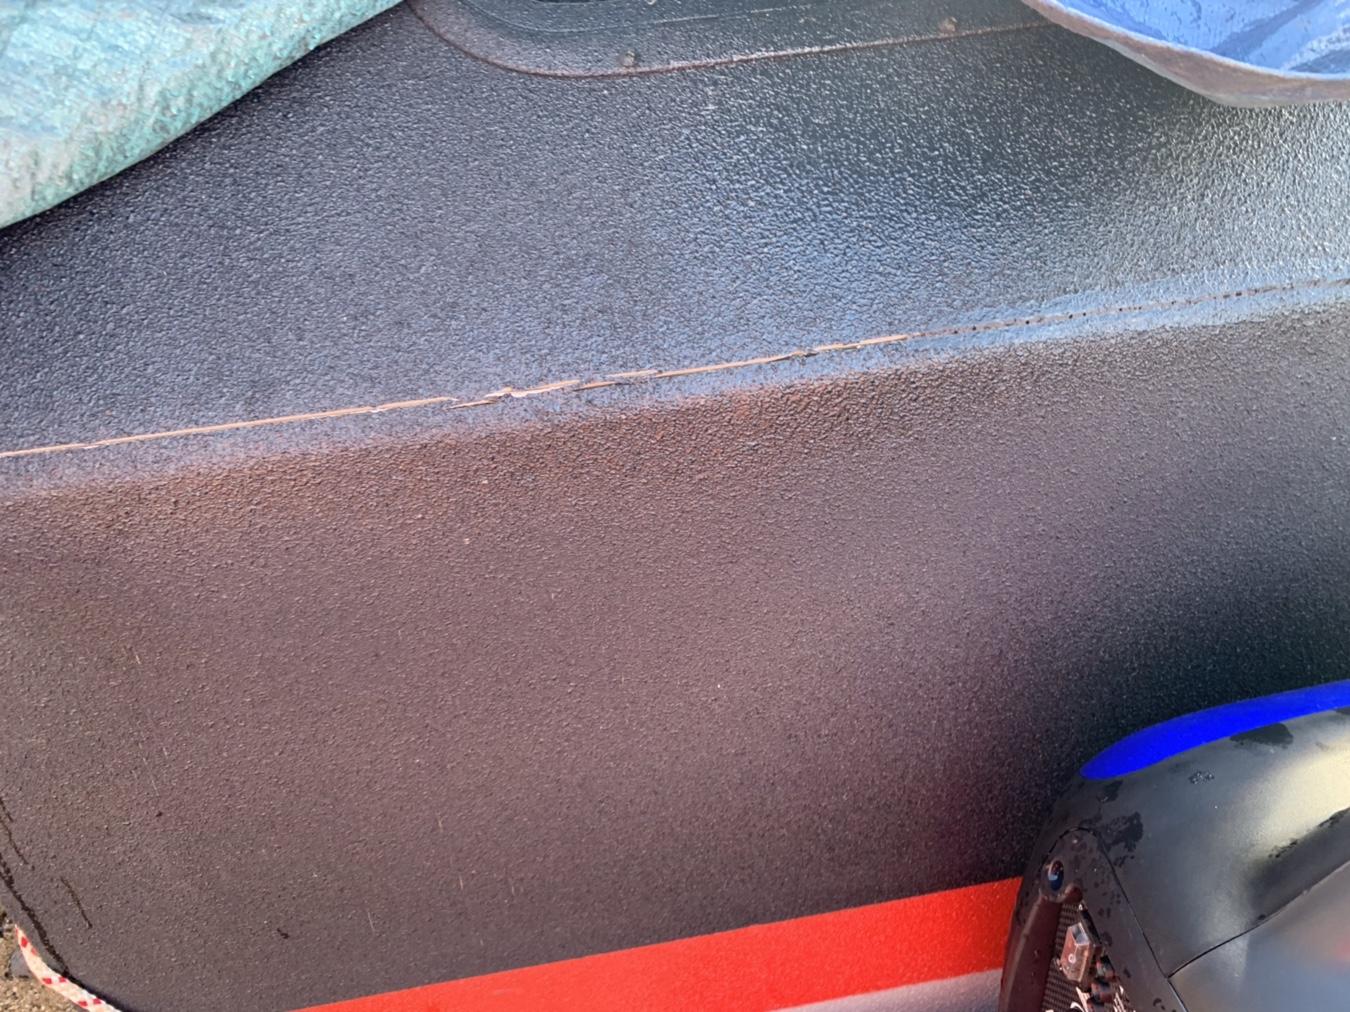 Raptor Liner on wood sides trailer not holding up? How can I